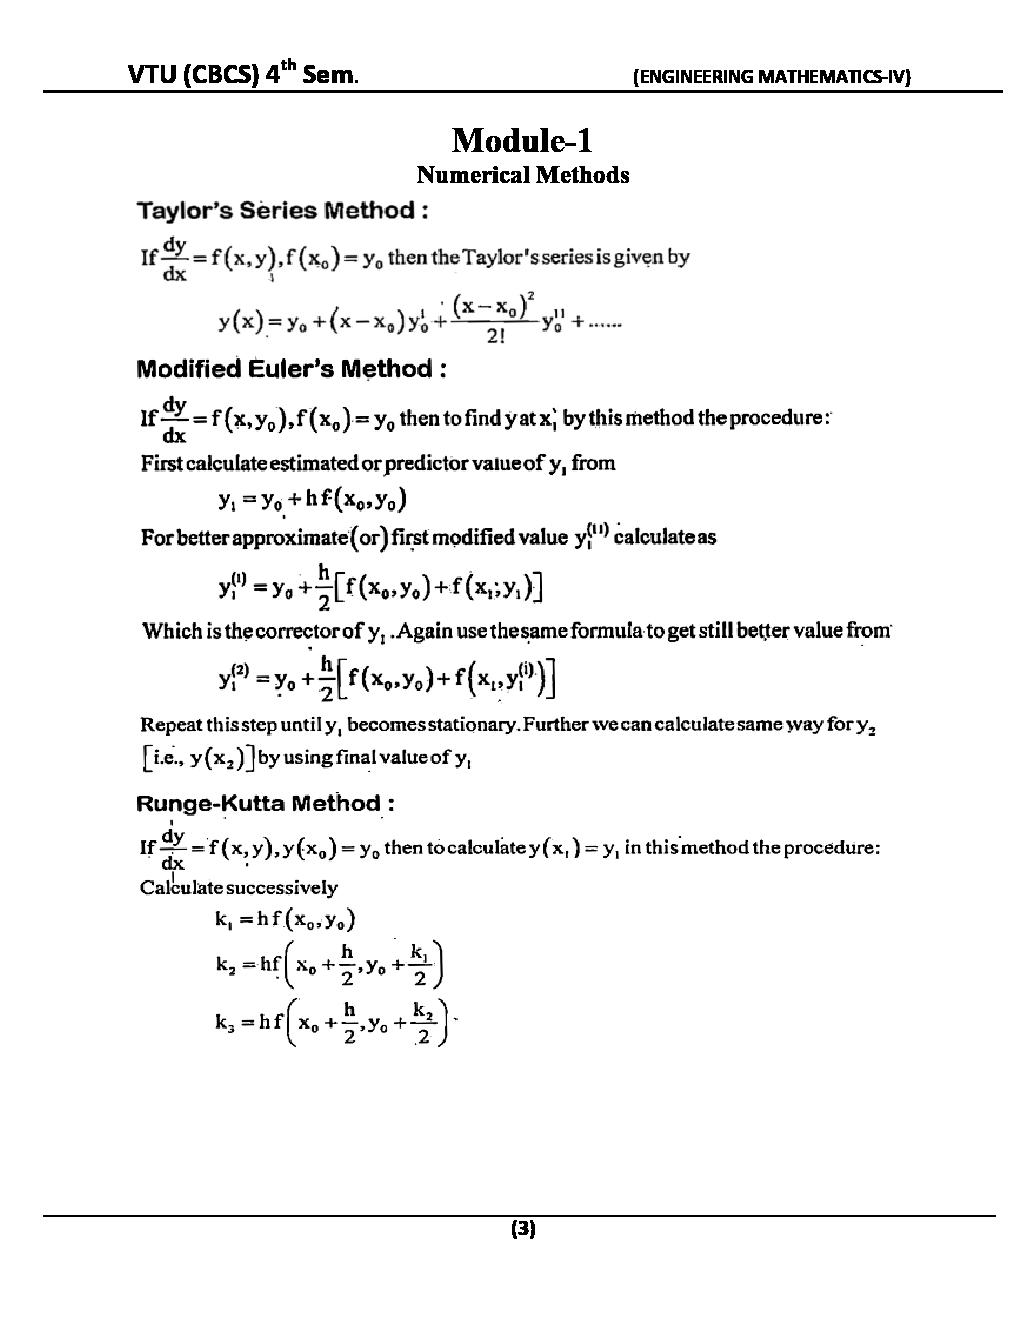 Engineering Mathematics-IV  For VTU BE 4th Sem Civil Engineering - Page 4